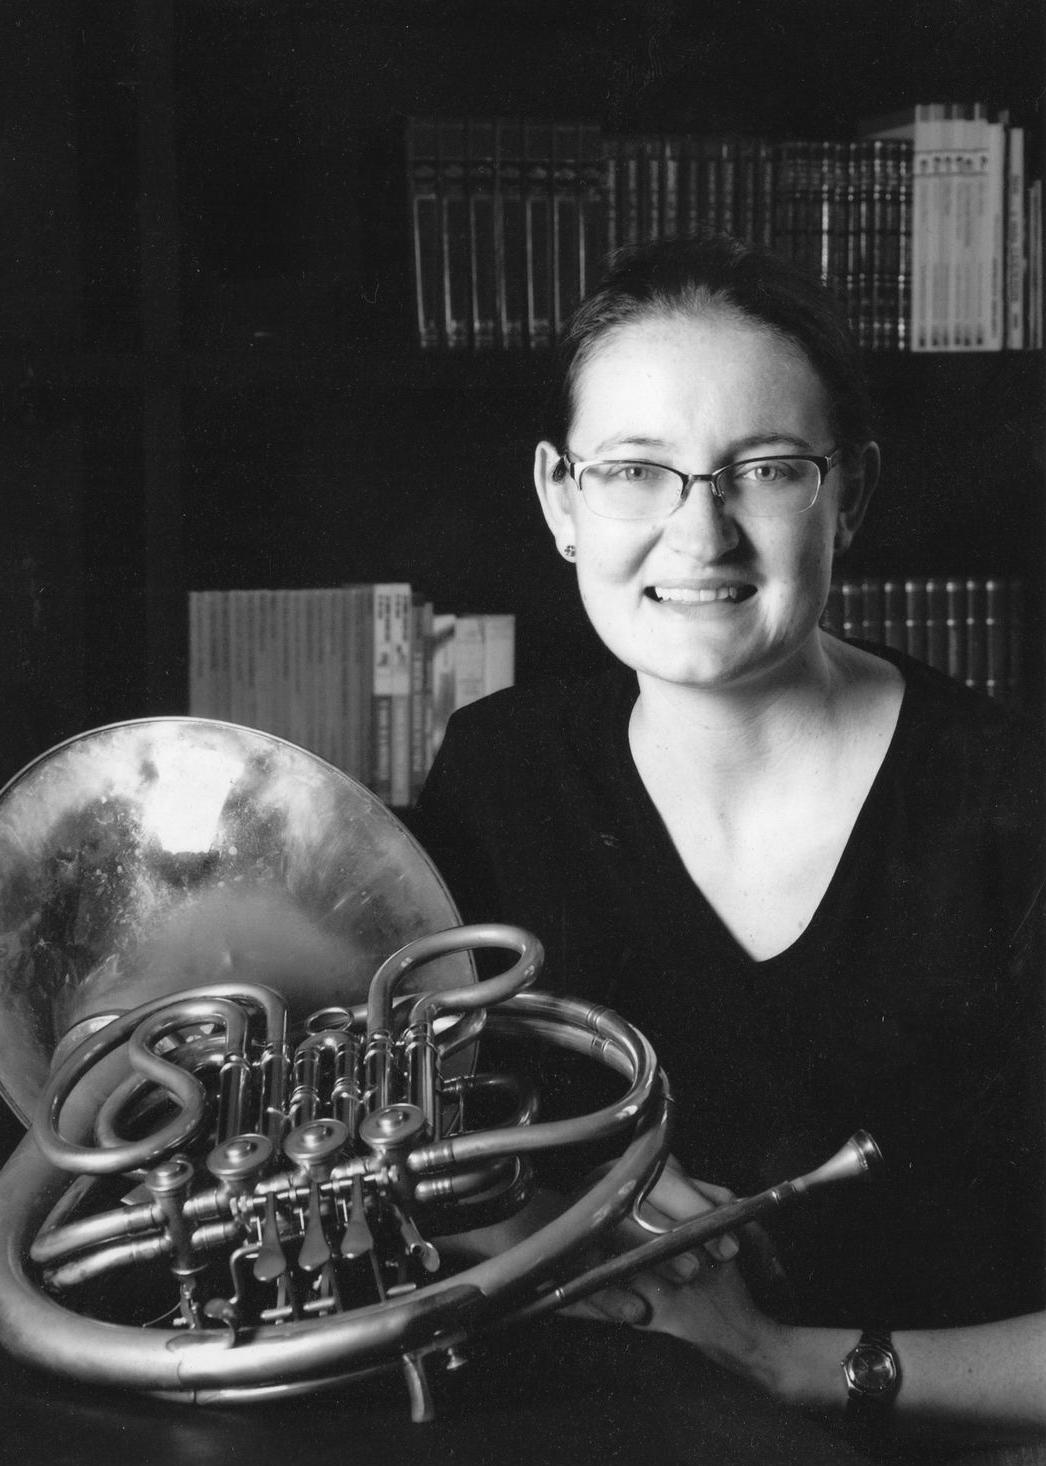 Claire Hellweg